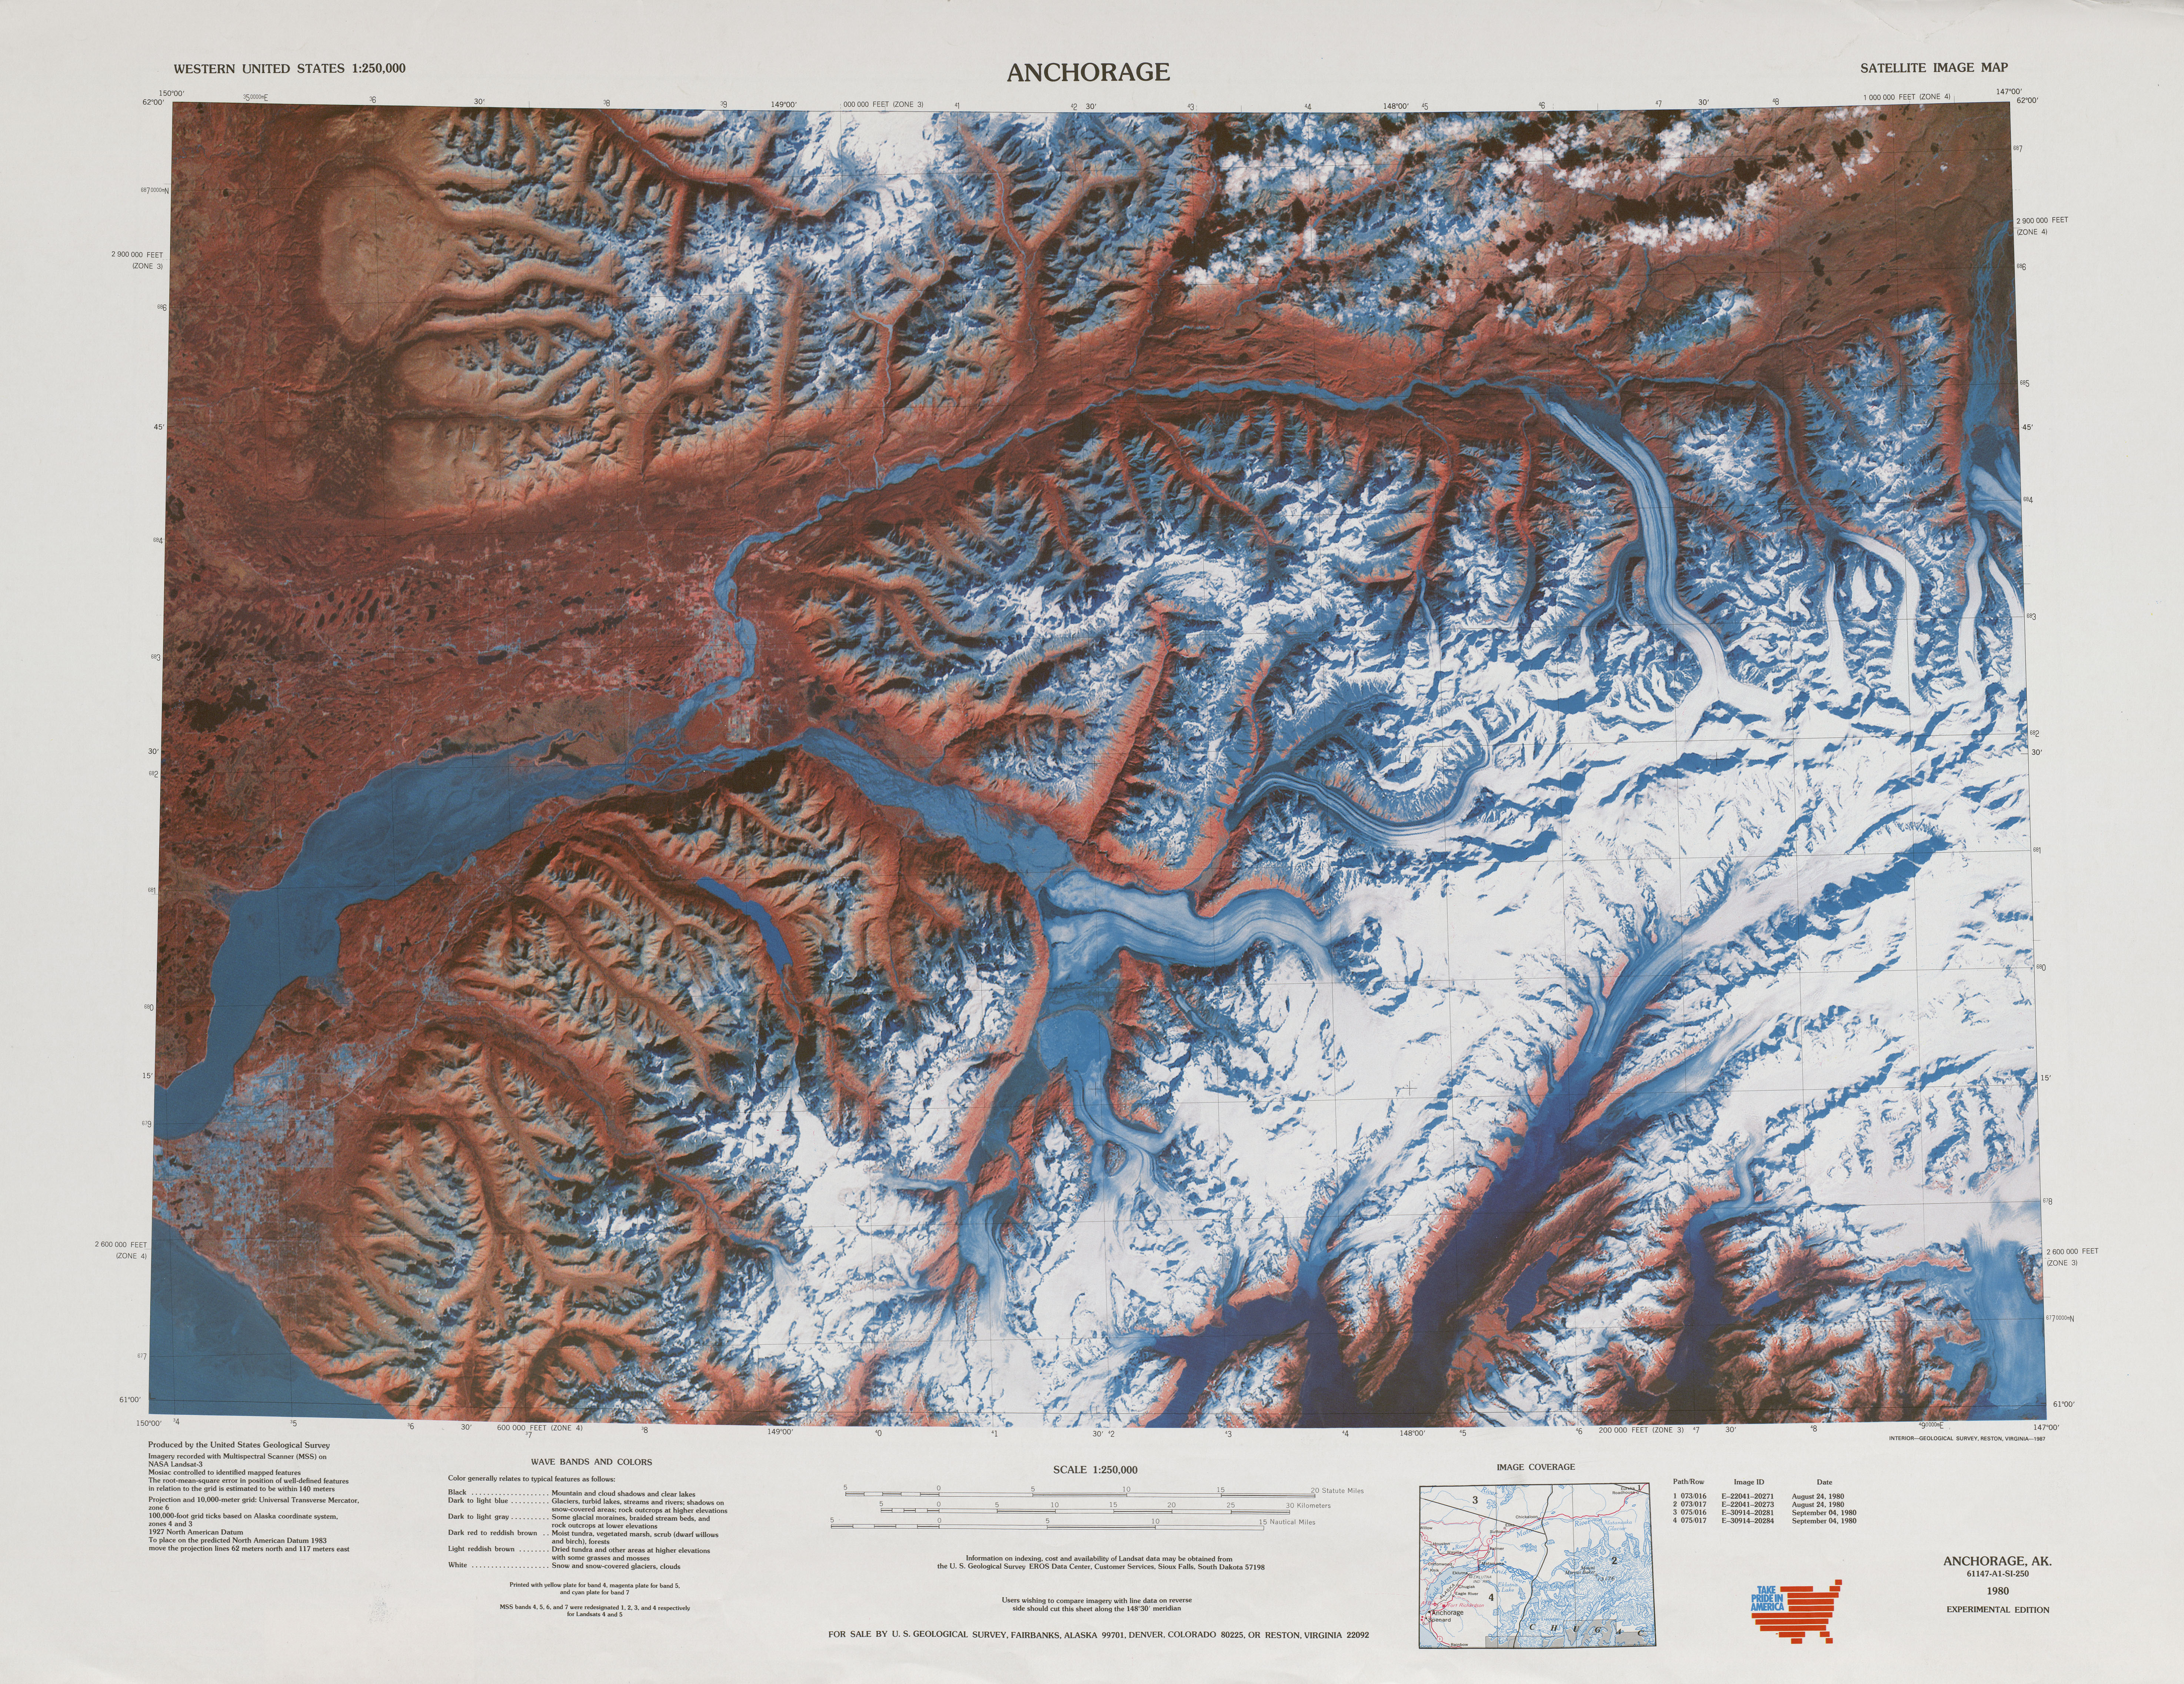 Anchorage Satellite Image Sheet, United States 1985